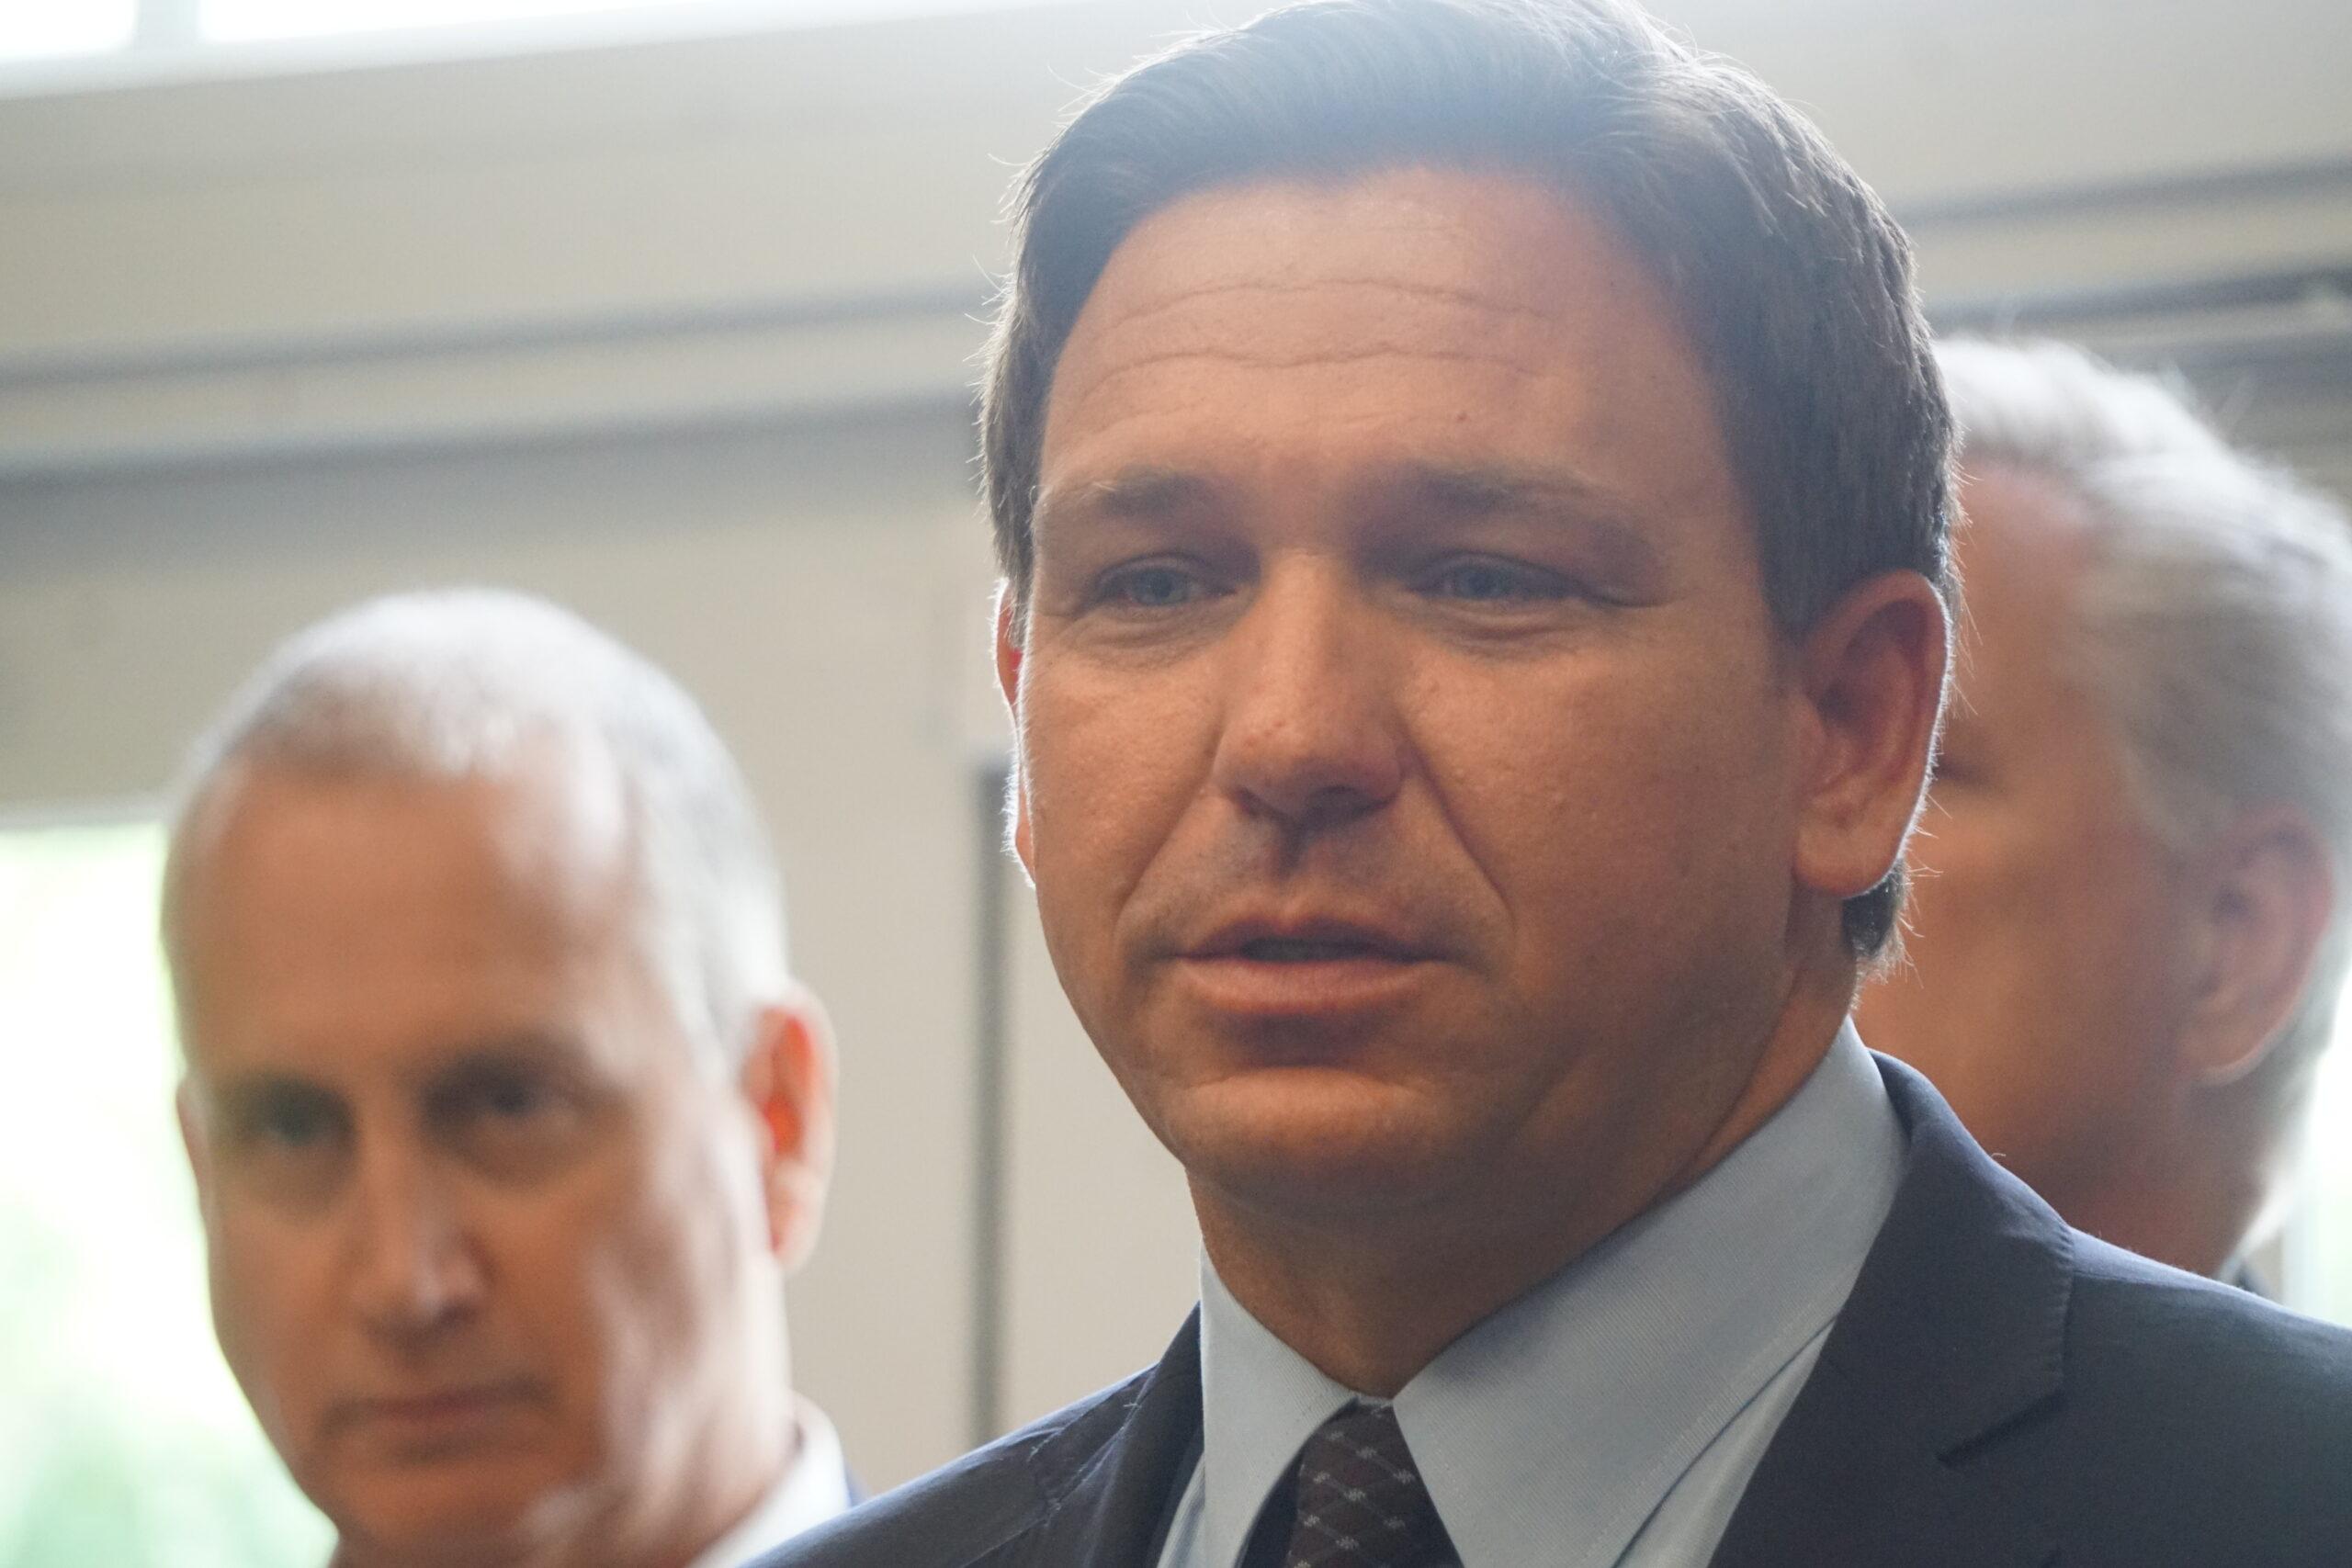 Ron DeSantis: The $40 Million Governor